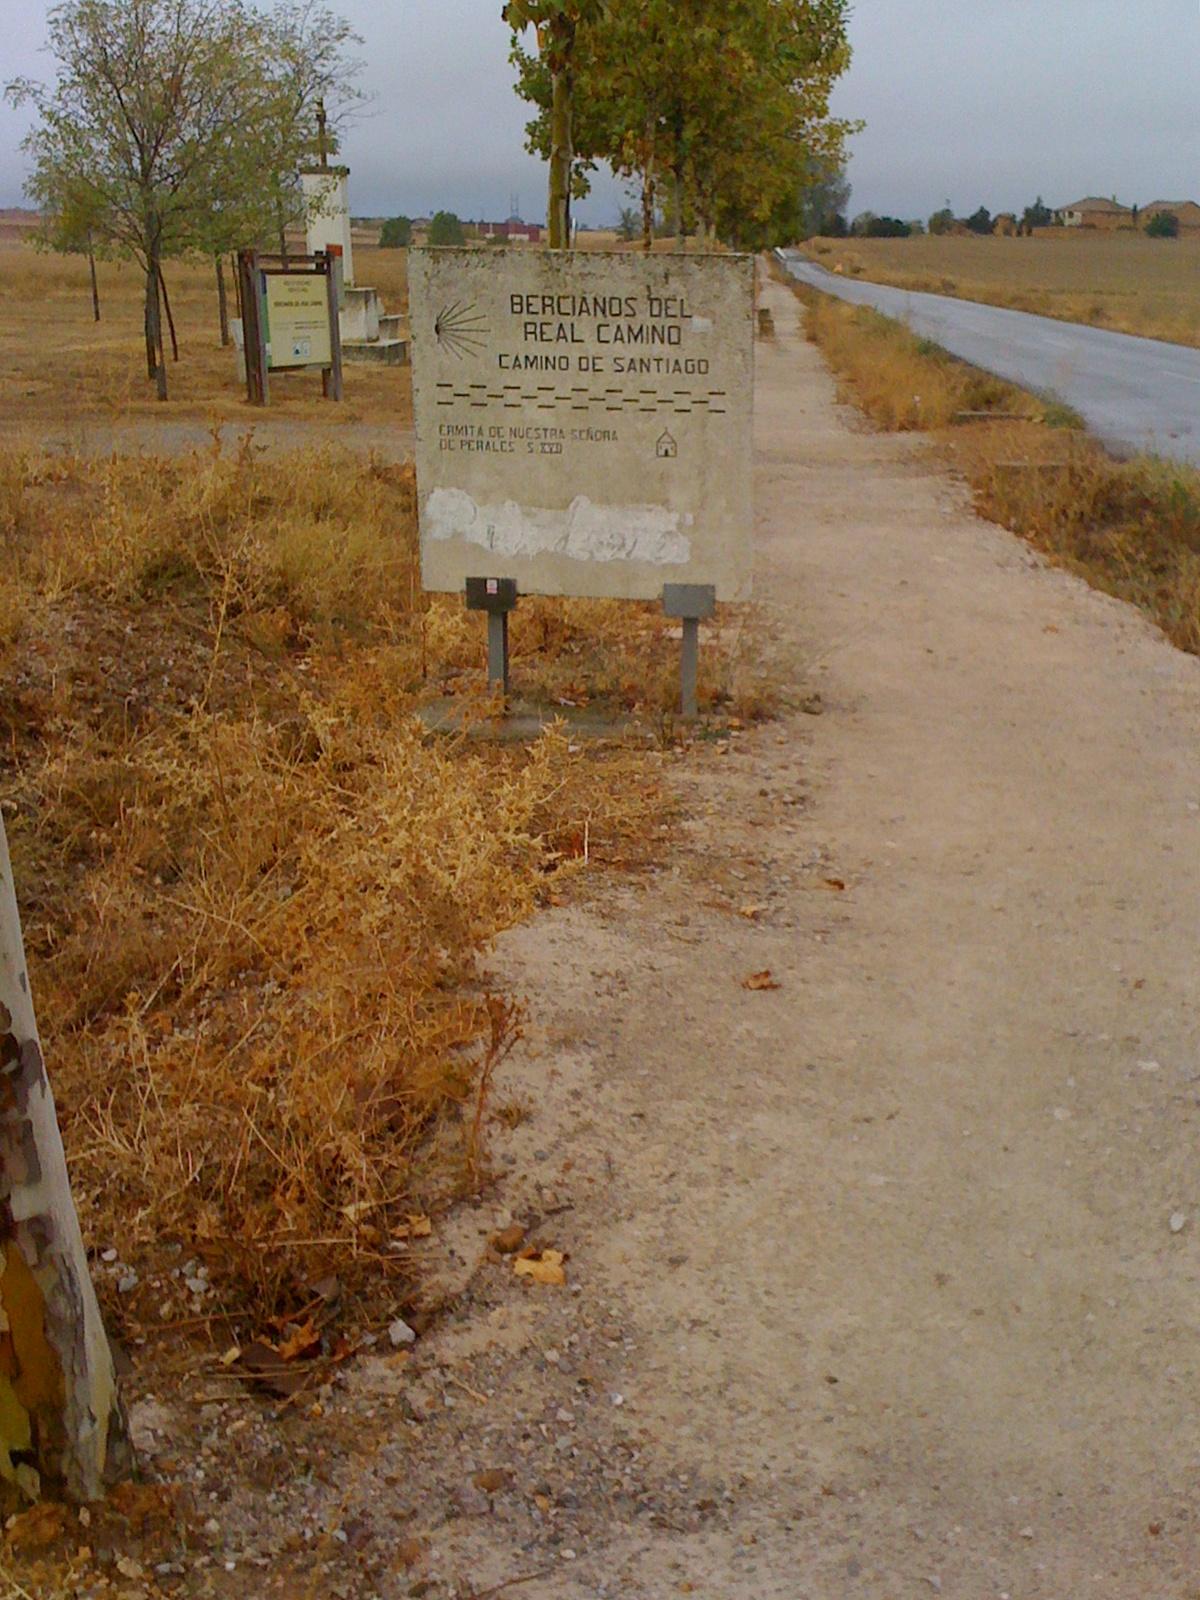 auf dem Camino der Ort Bercianos del Real Camino